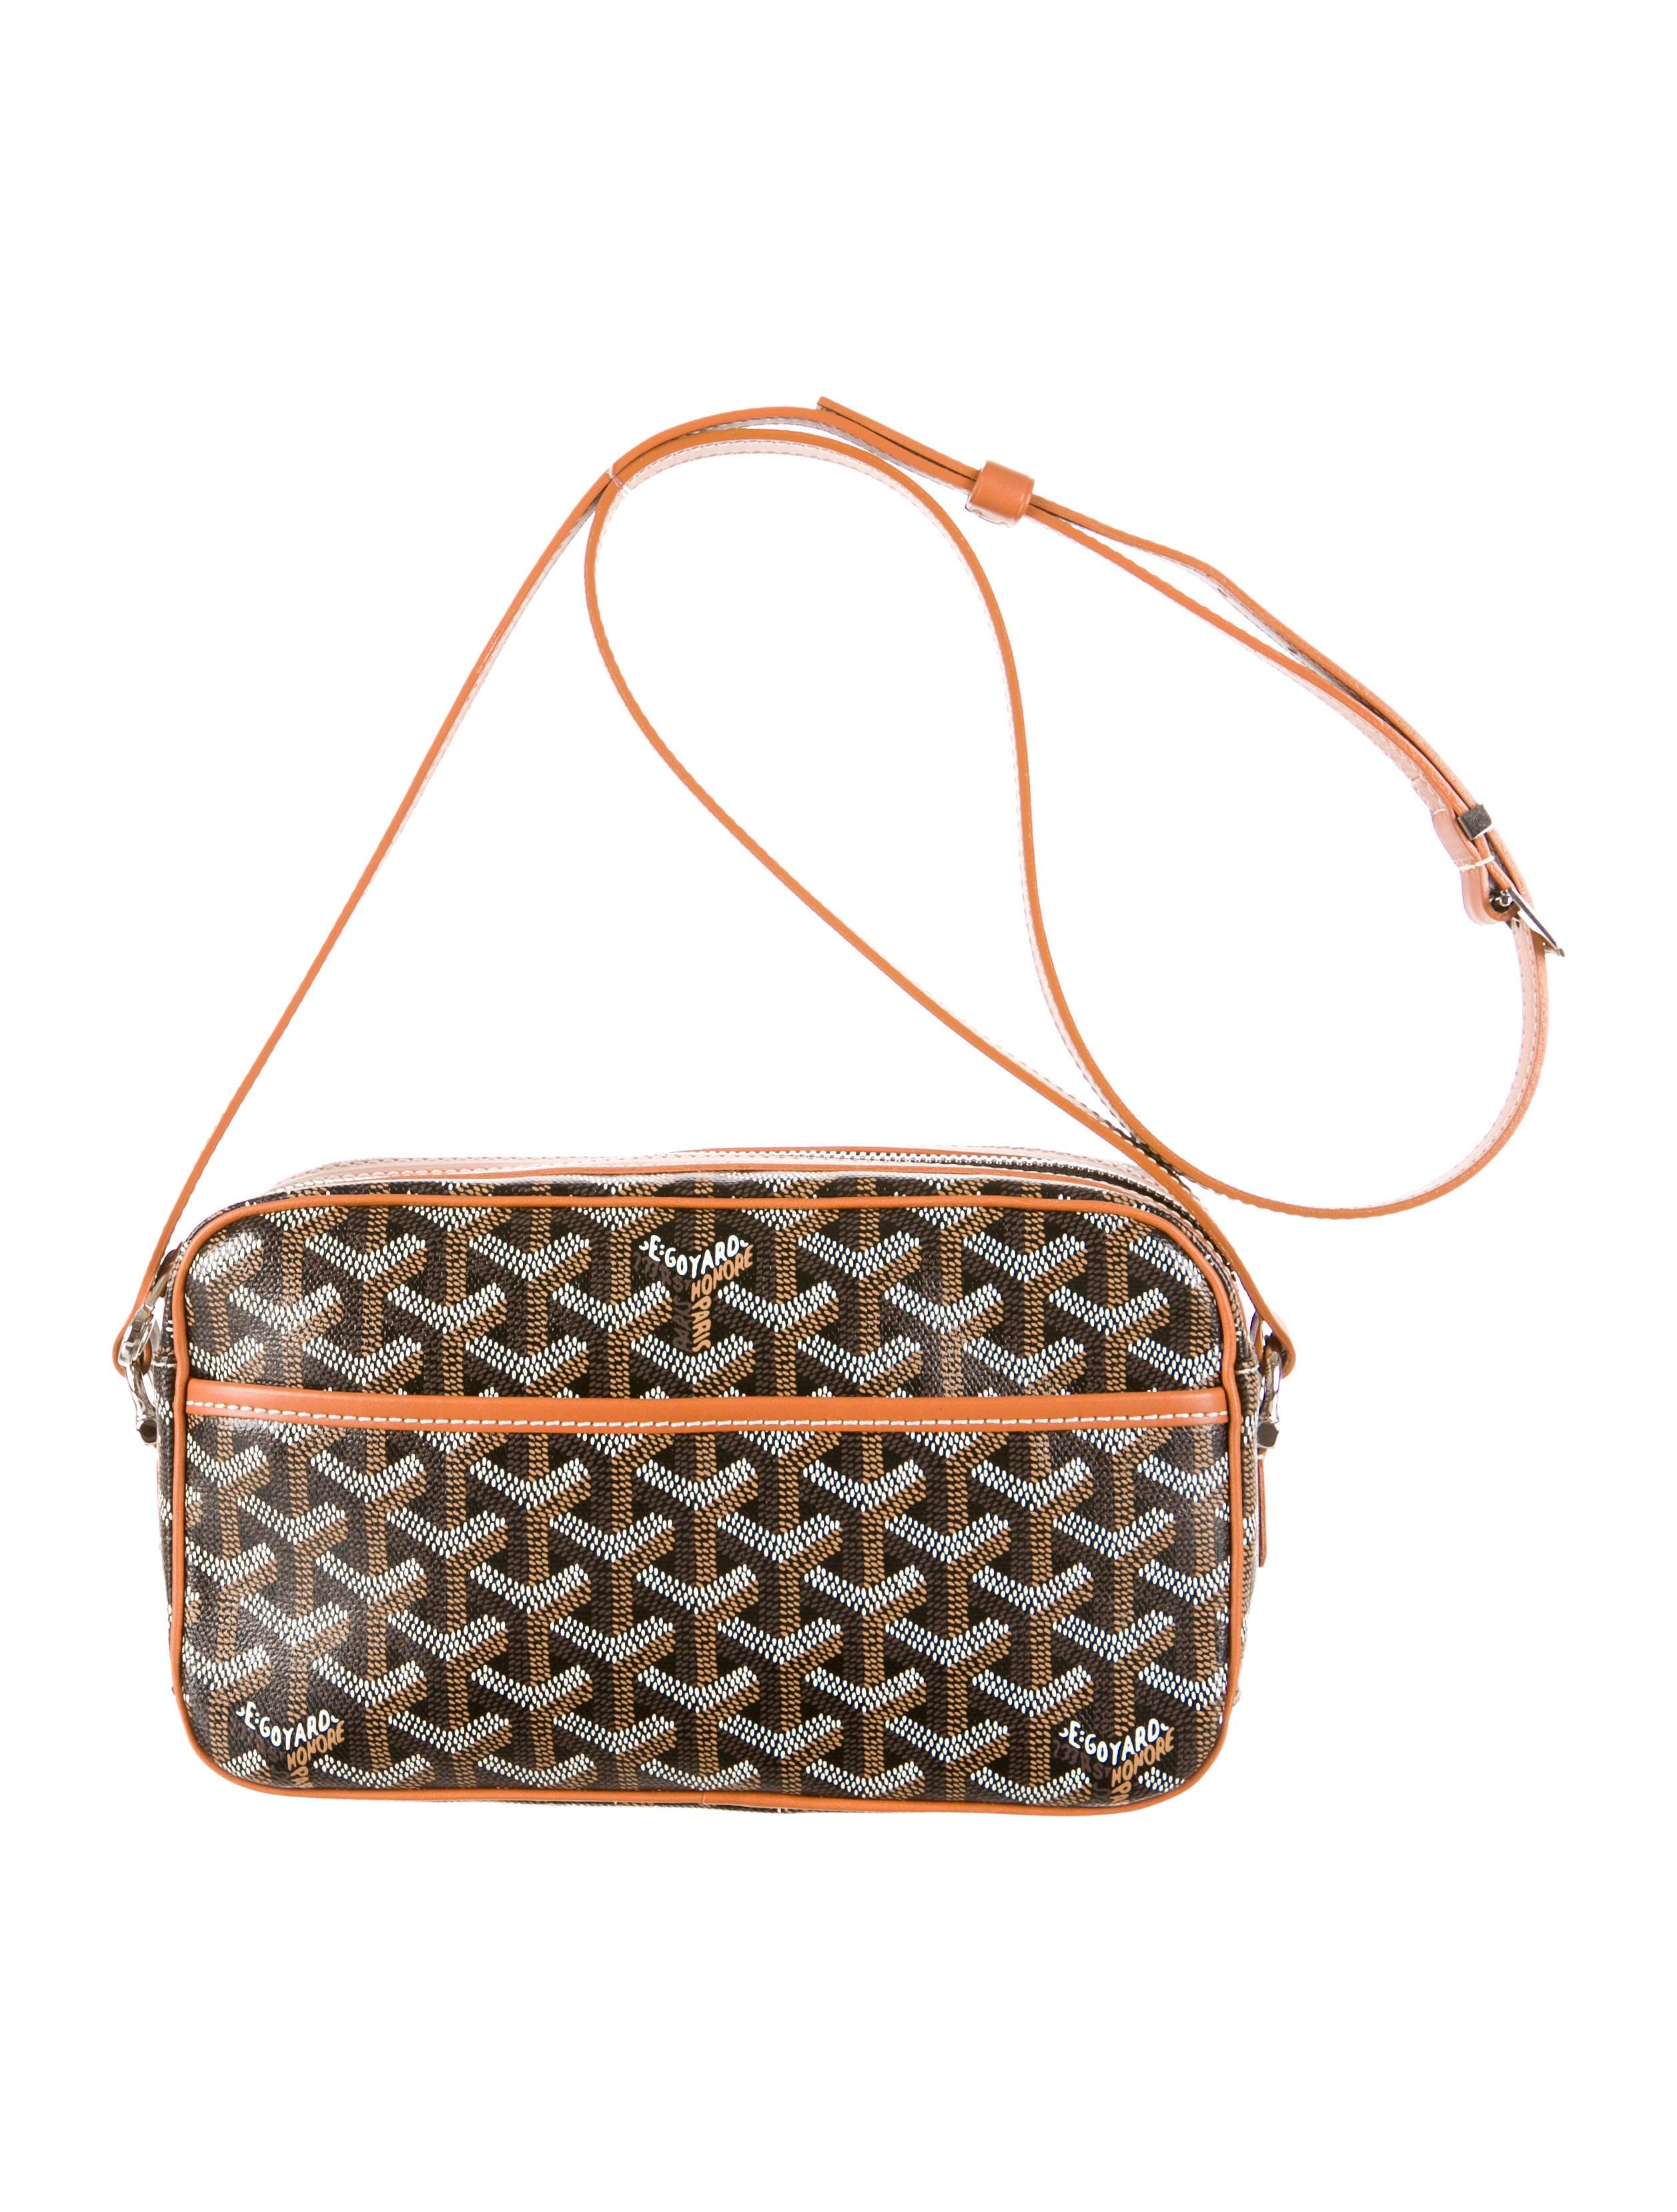 Goyard Cap Vert Pm W Tags Handbags Goy20380 The